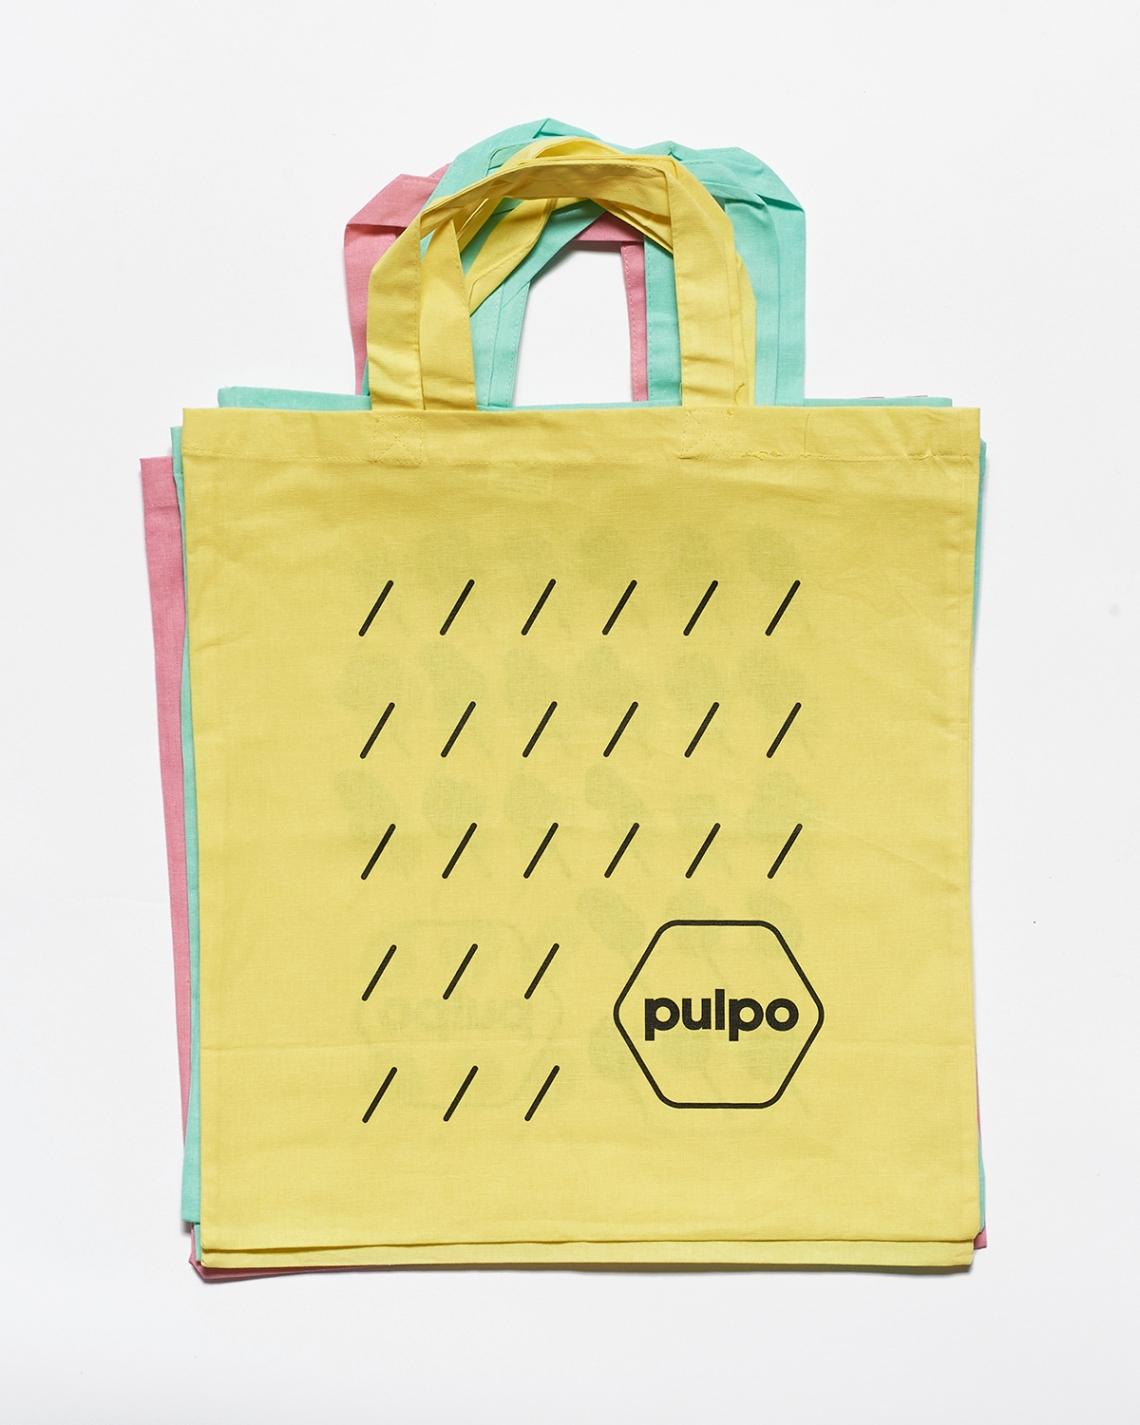 sign_pulpo002